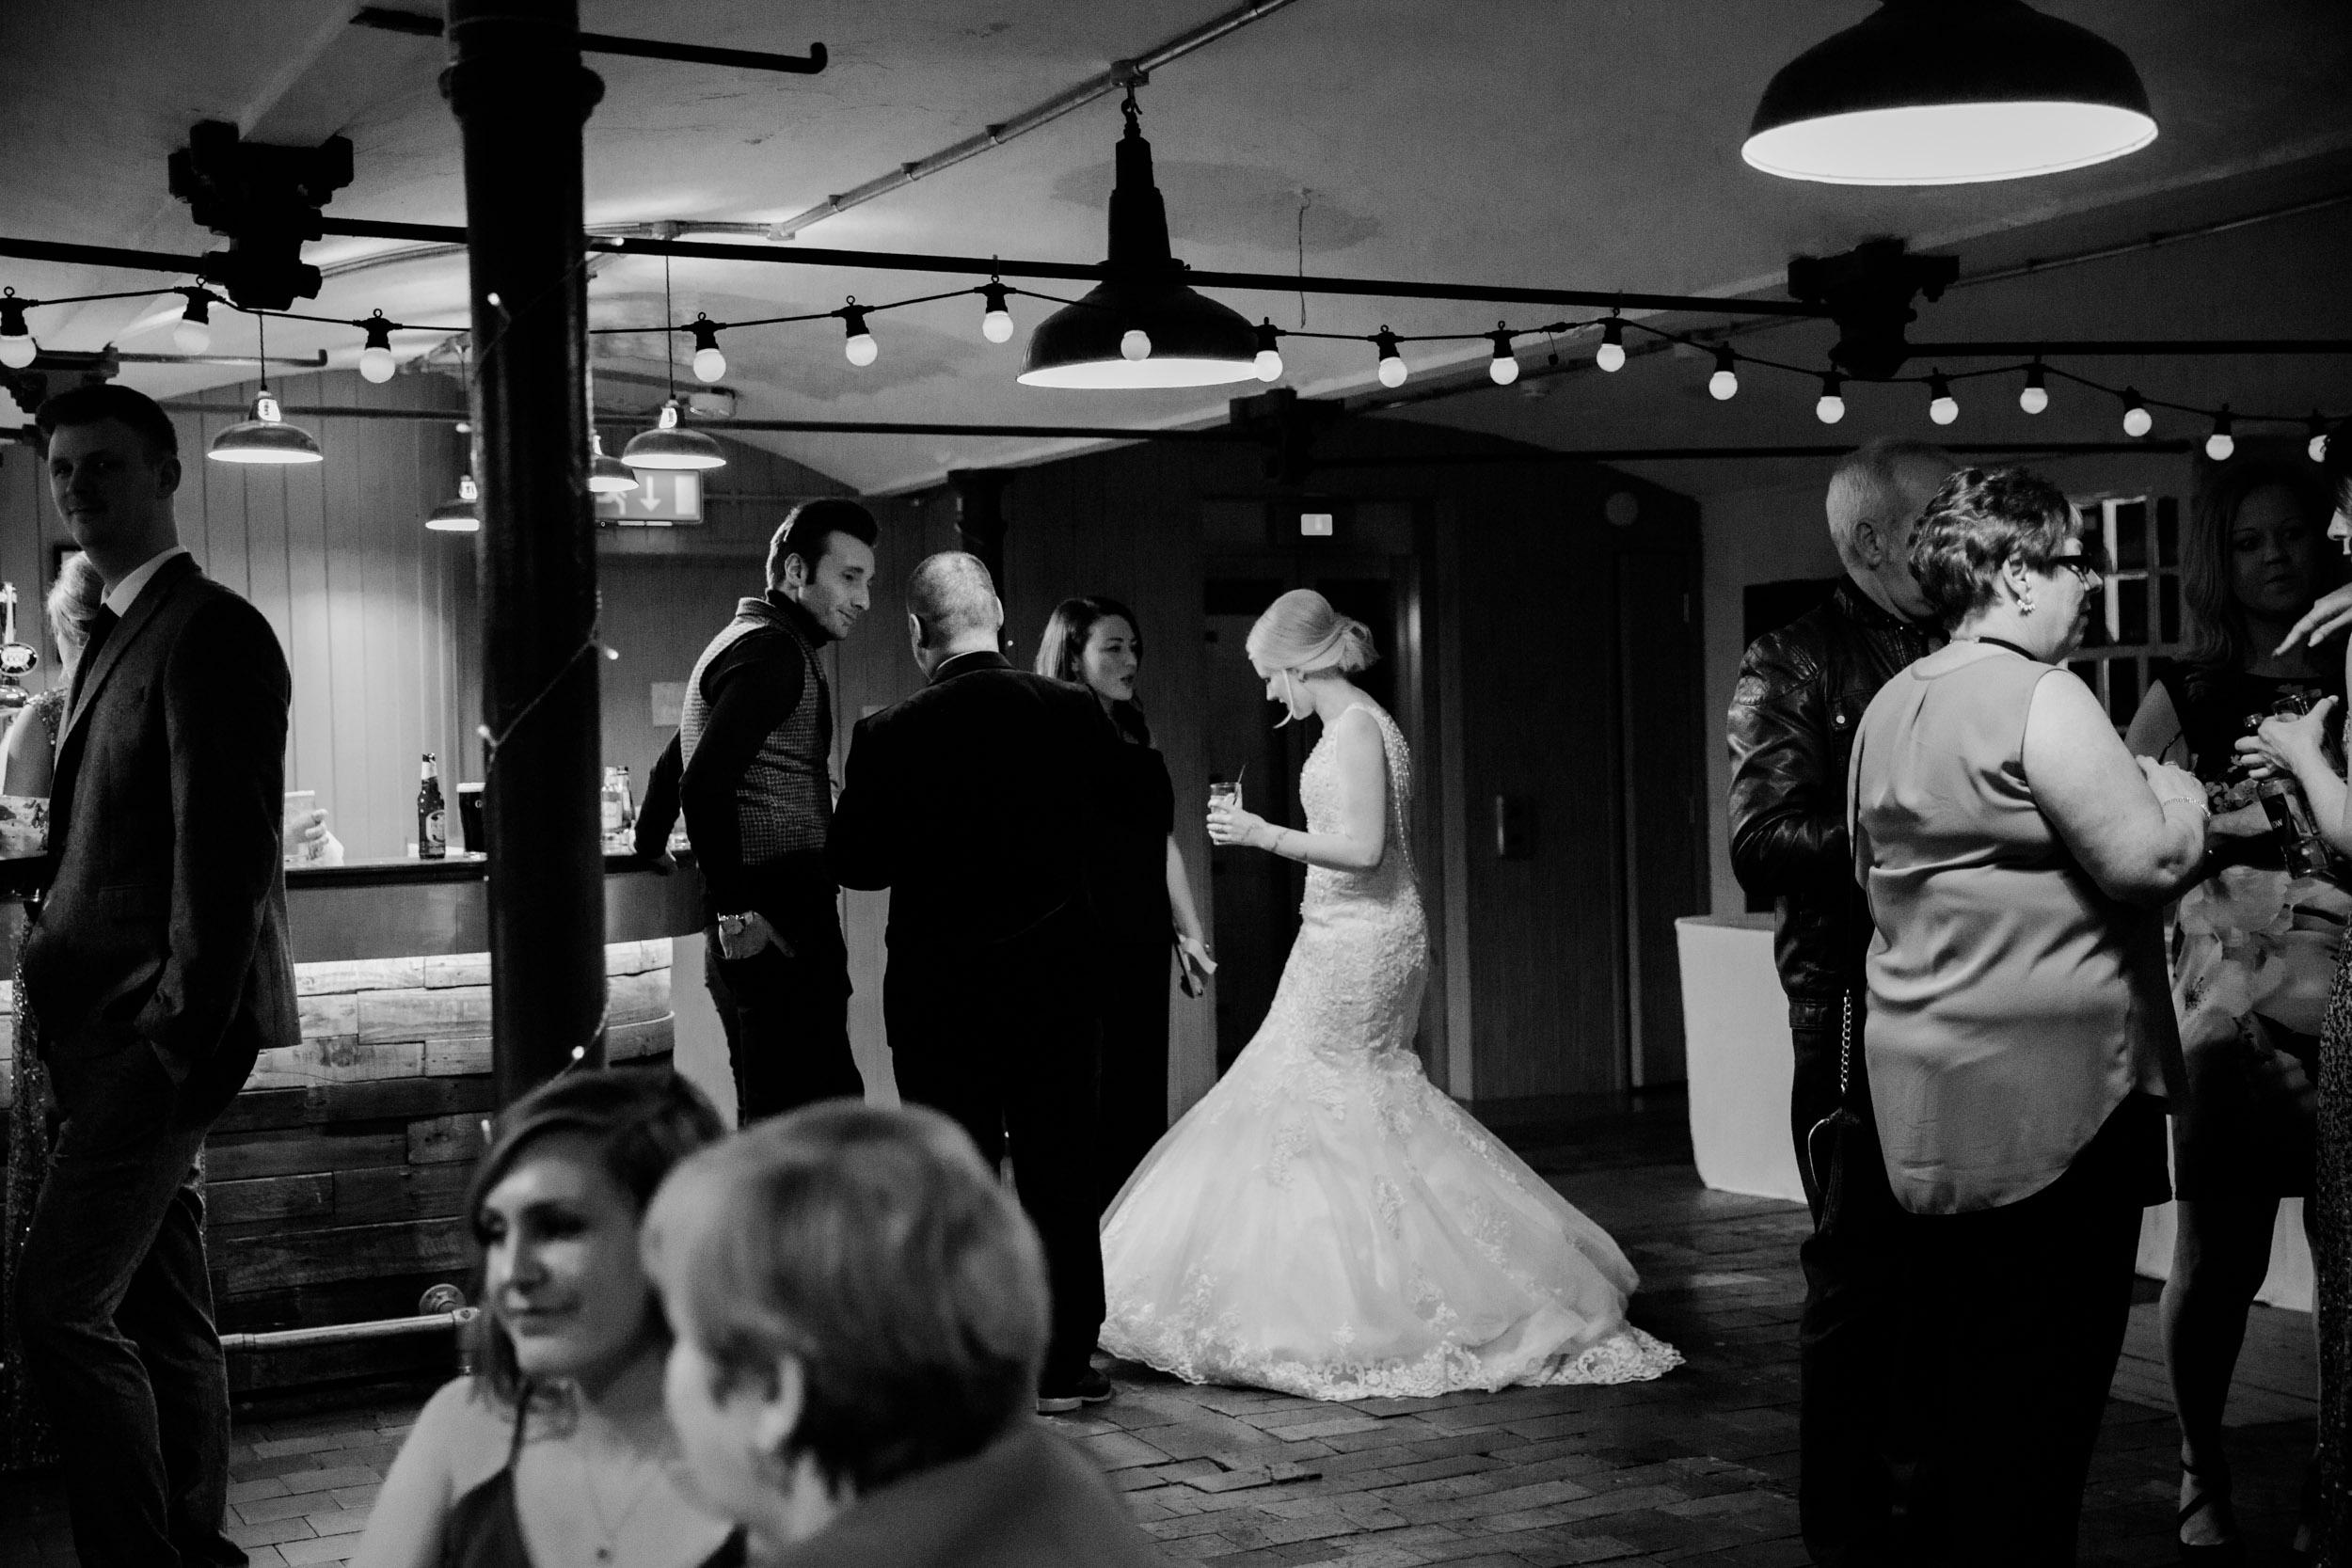 Industrial_glamour_wedding_west_mill_derby174